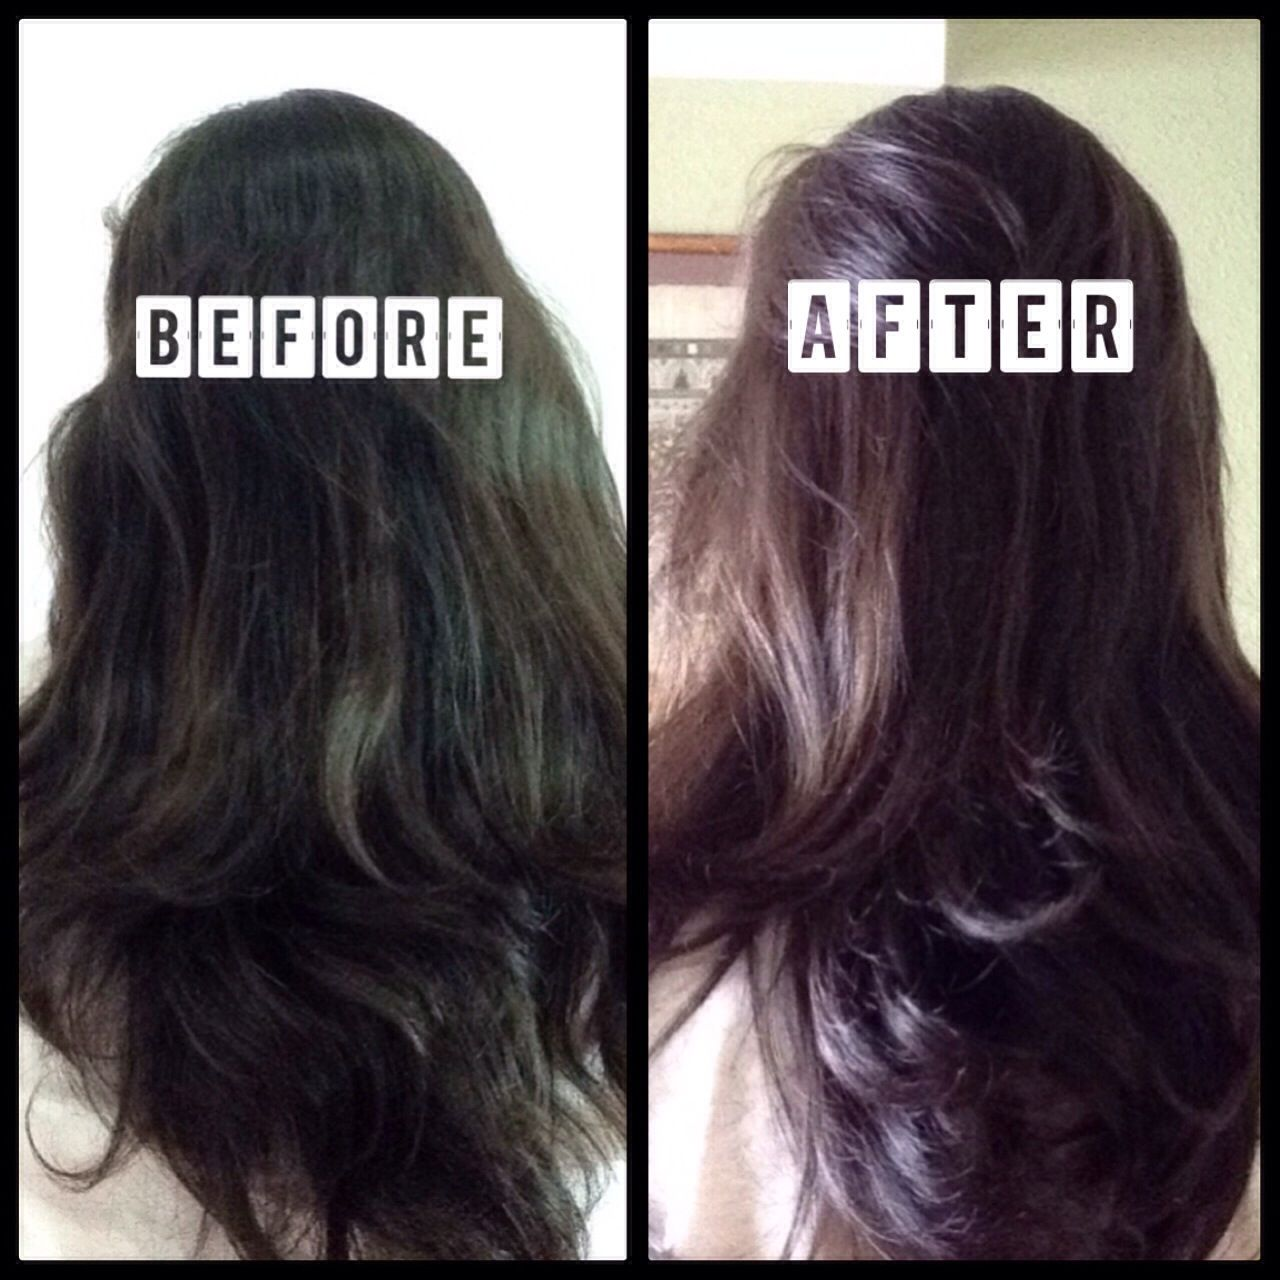 How To Lighten Your Hair With Cinnamon And Honey Recipe Lighten Hair Naturally Lightening Dark Hair How To Lighten Hair